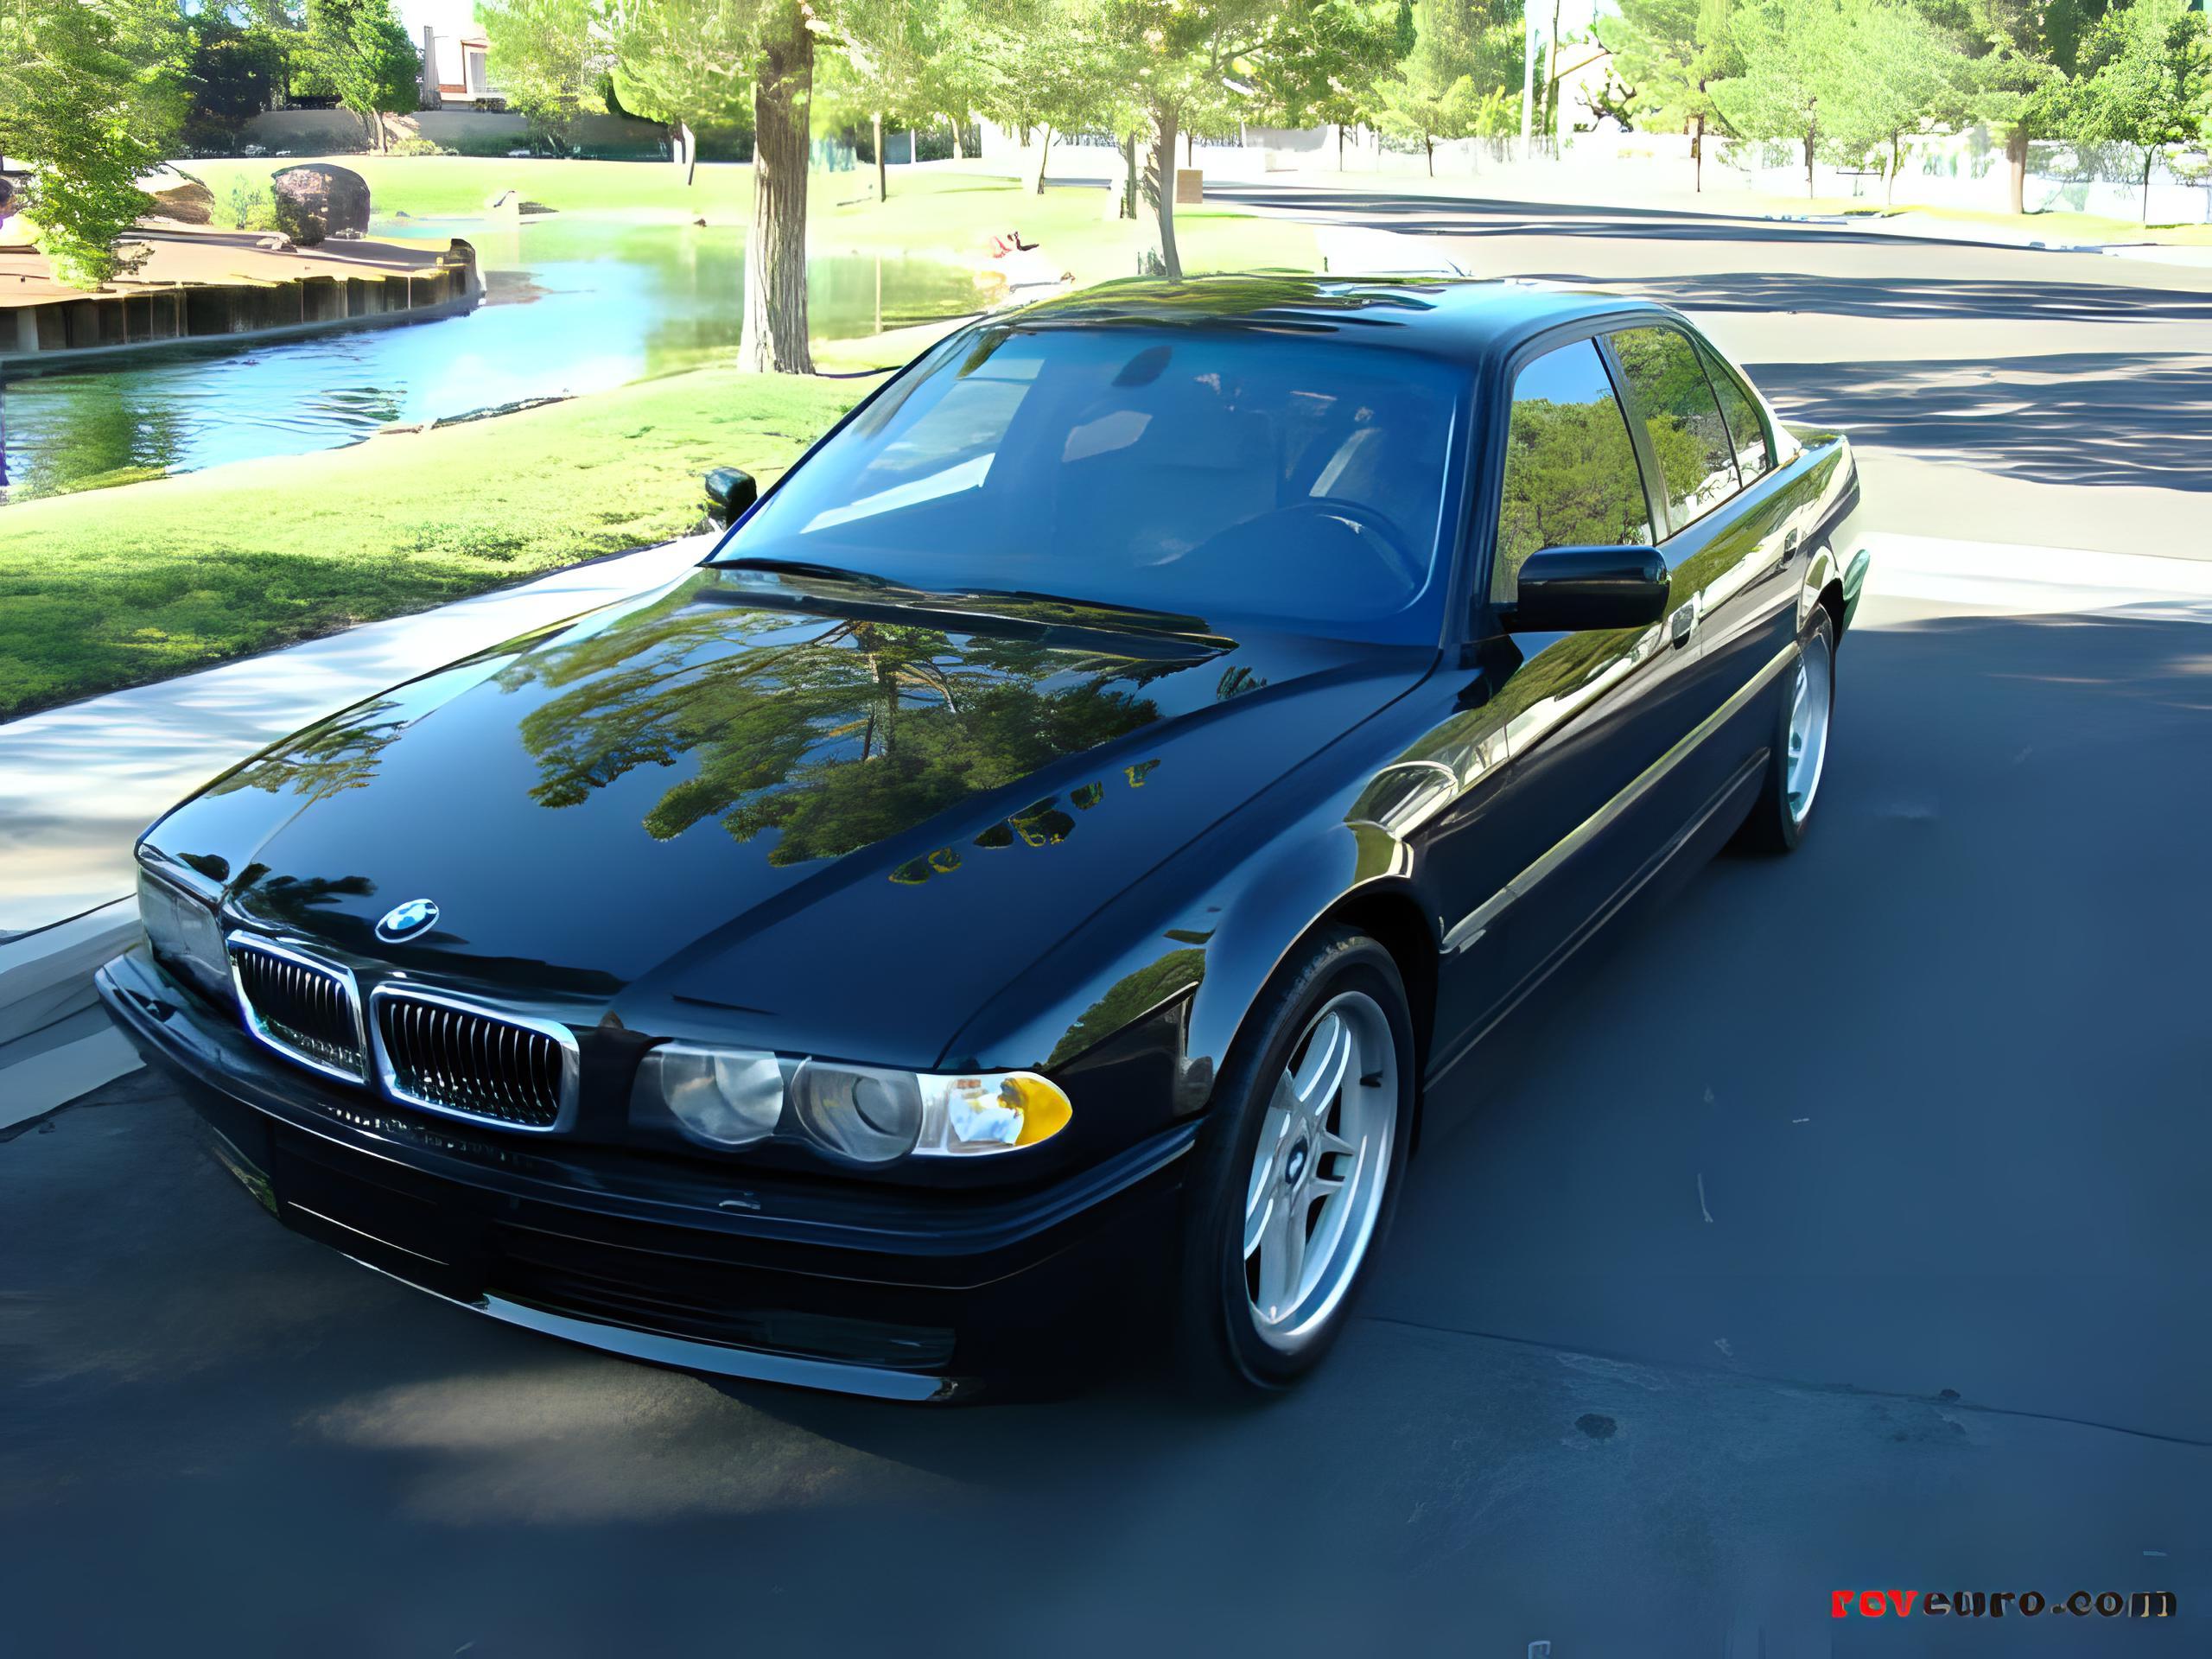 BMW Technical Details History Photos On Better Parts LTD - 740 i bmw